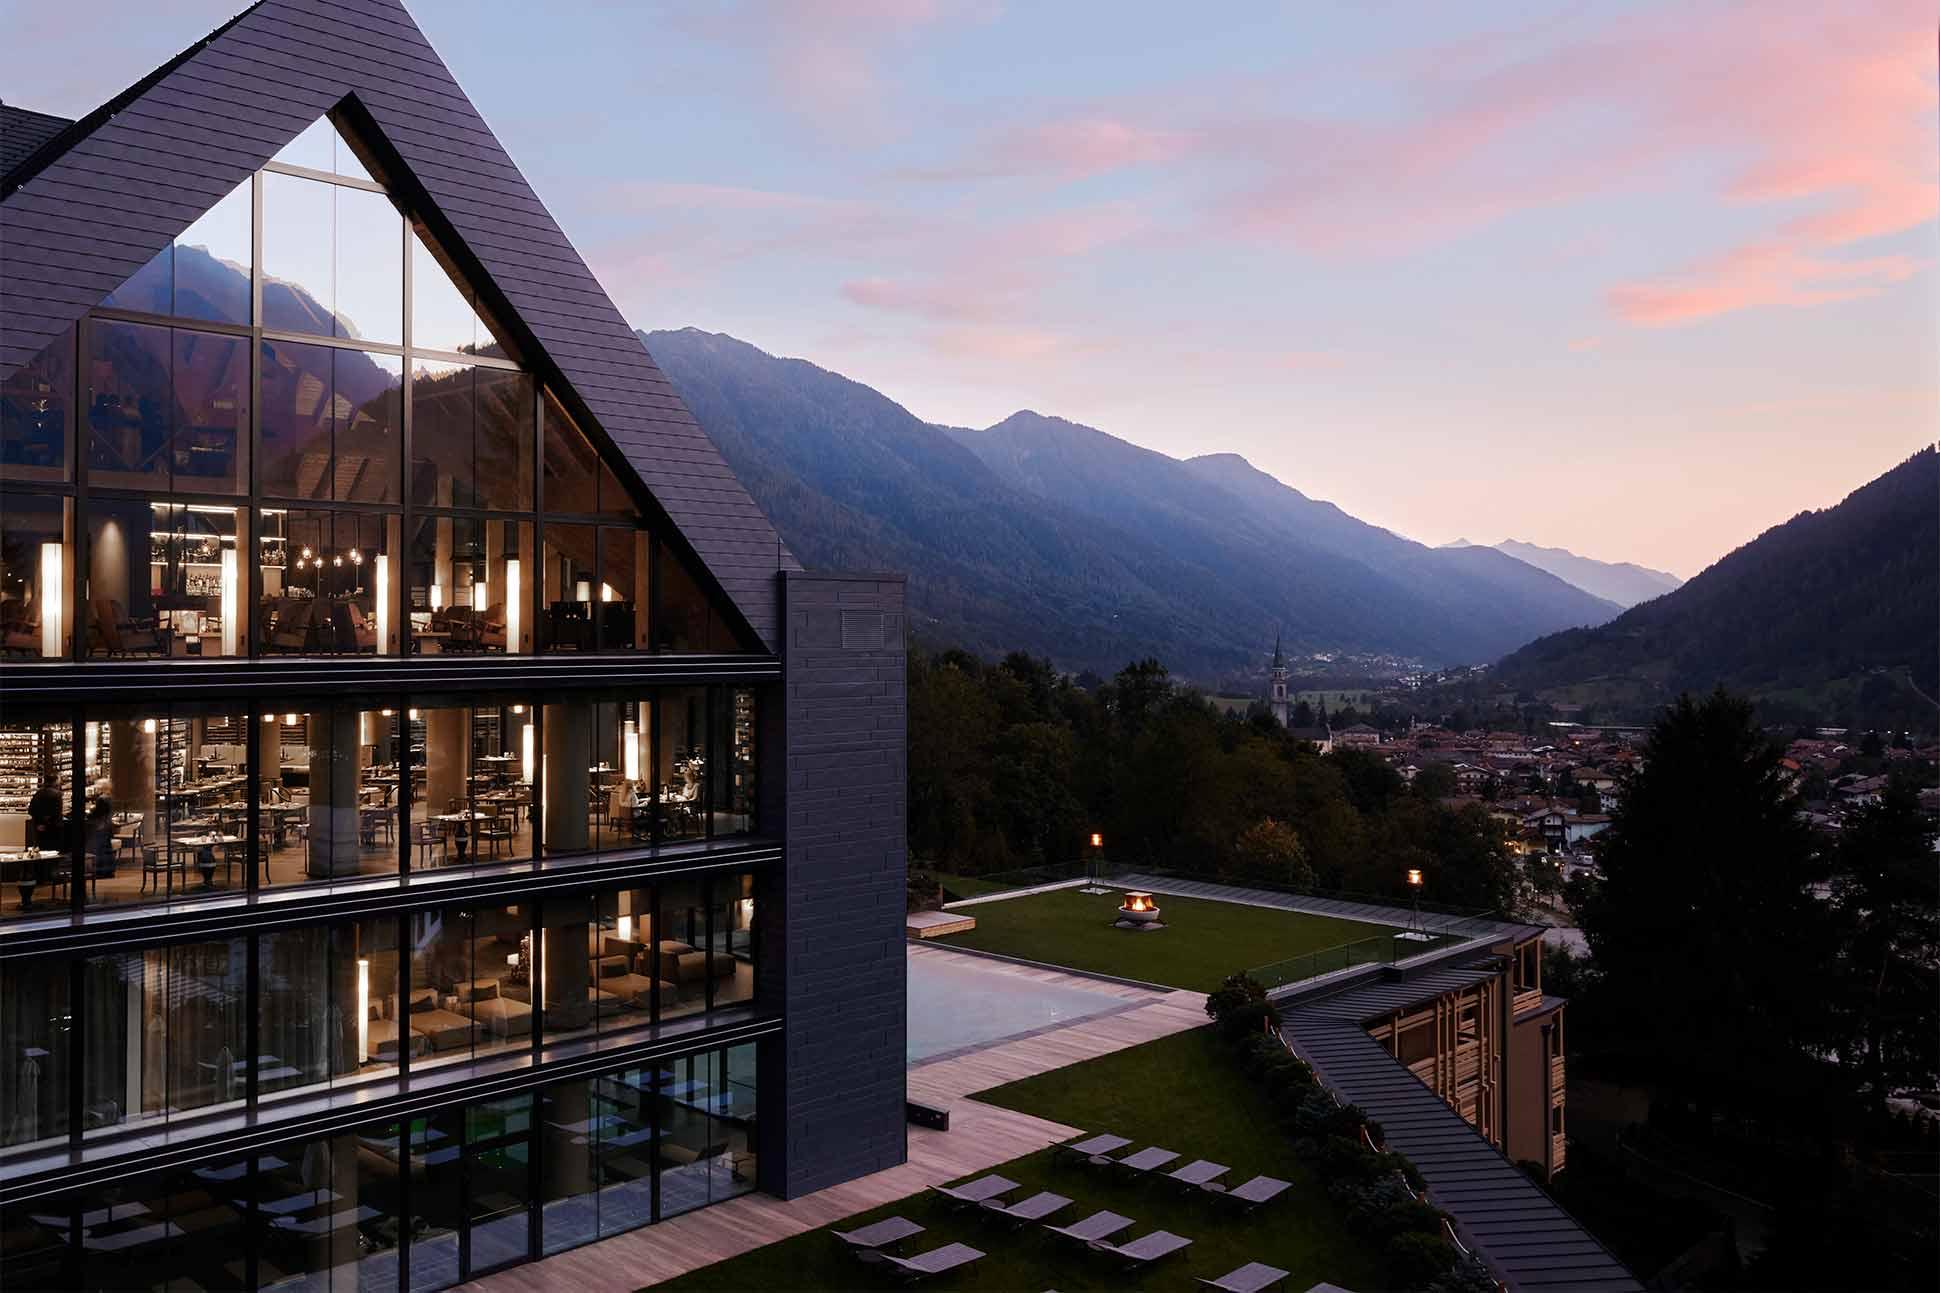 Exterior view of Lefay Resort and SPA Dolomiti, Trentino, Italy